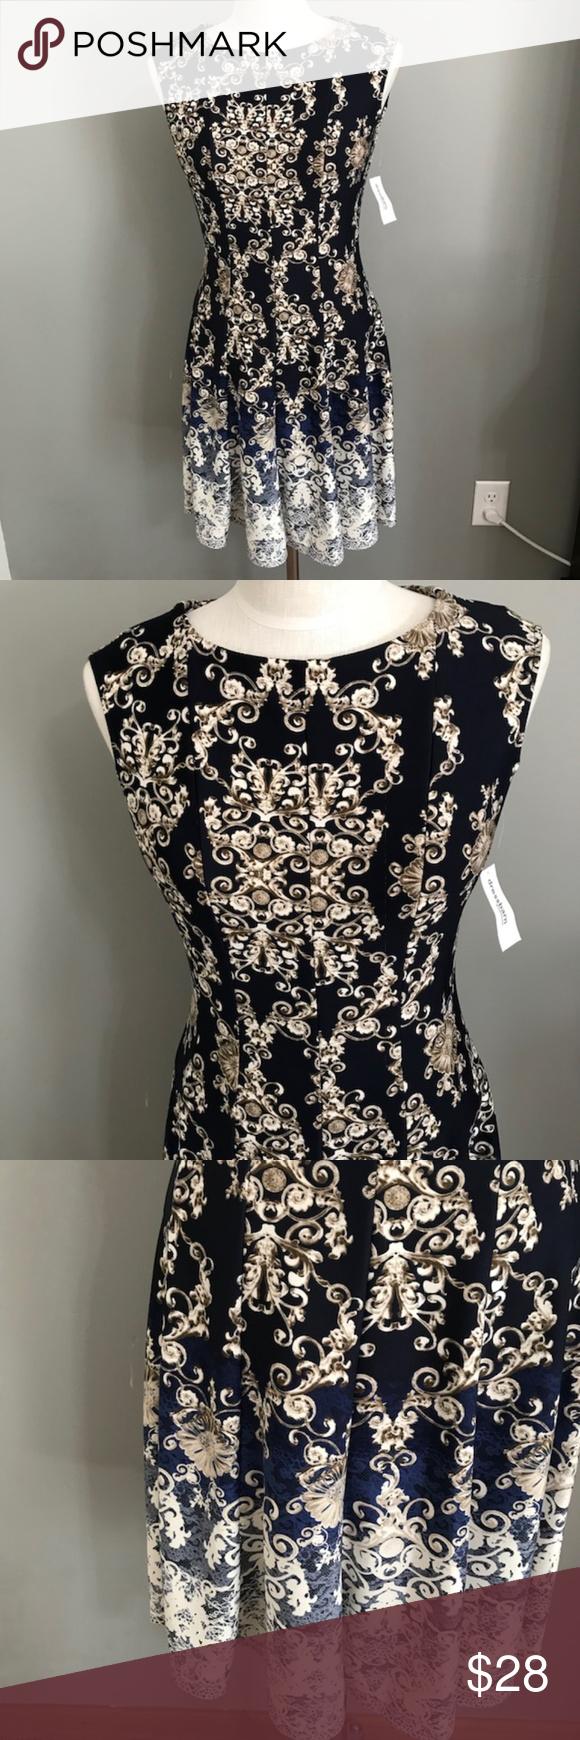 Sleeveless Nwt Blue Tan White Dress Size 6 Dresses Dress Barn Dresses Career Dress [ 1740 x 580 Pixel ]